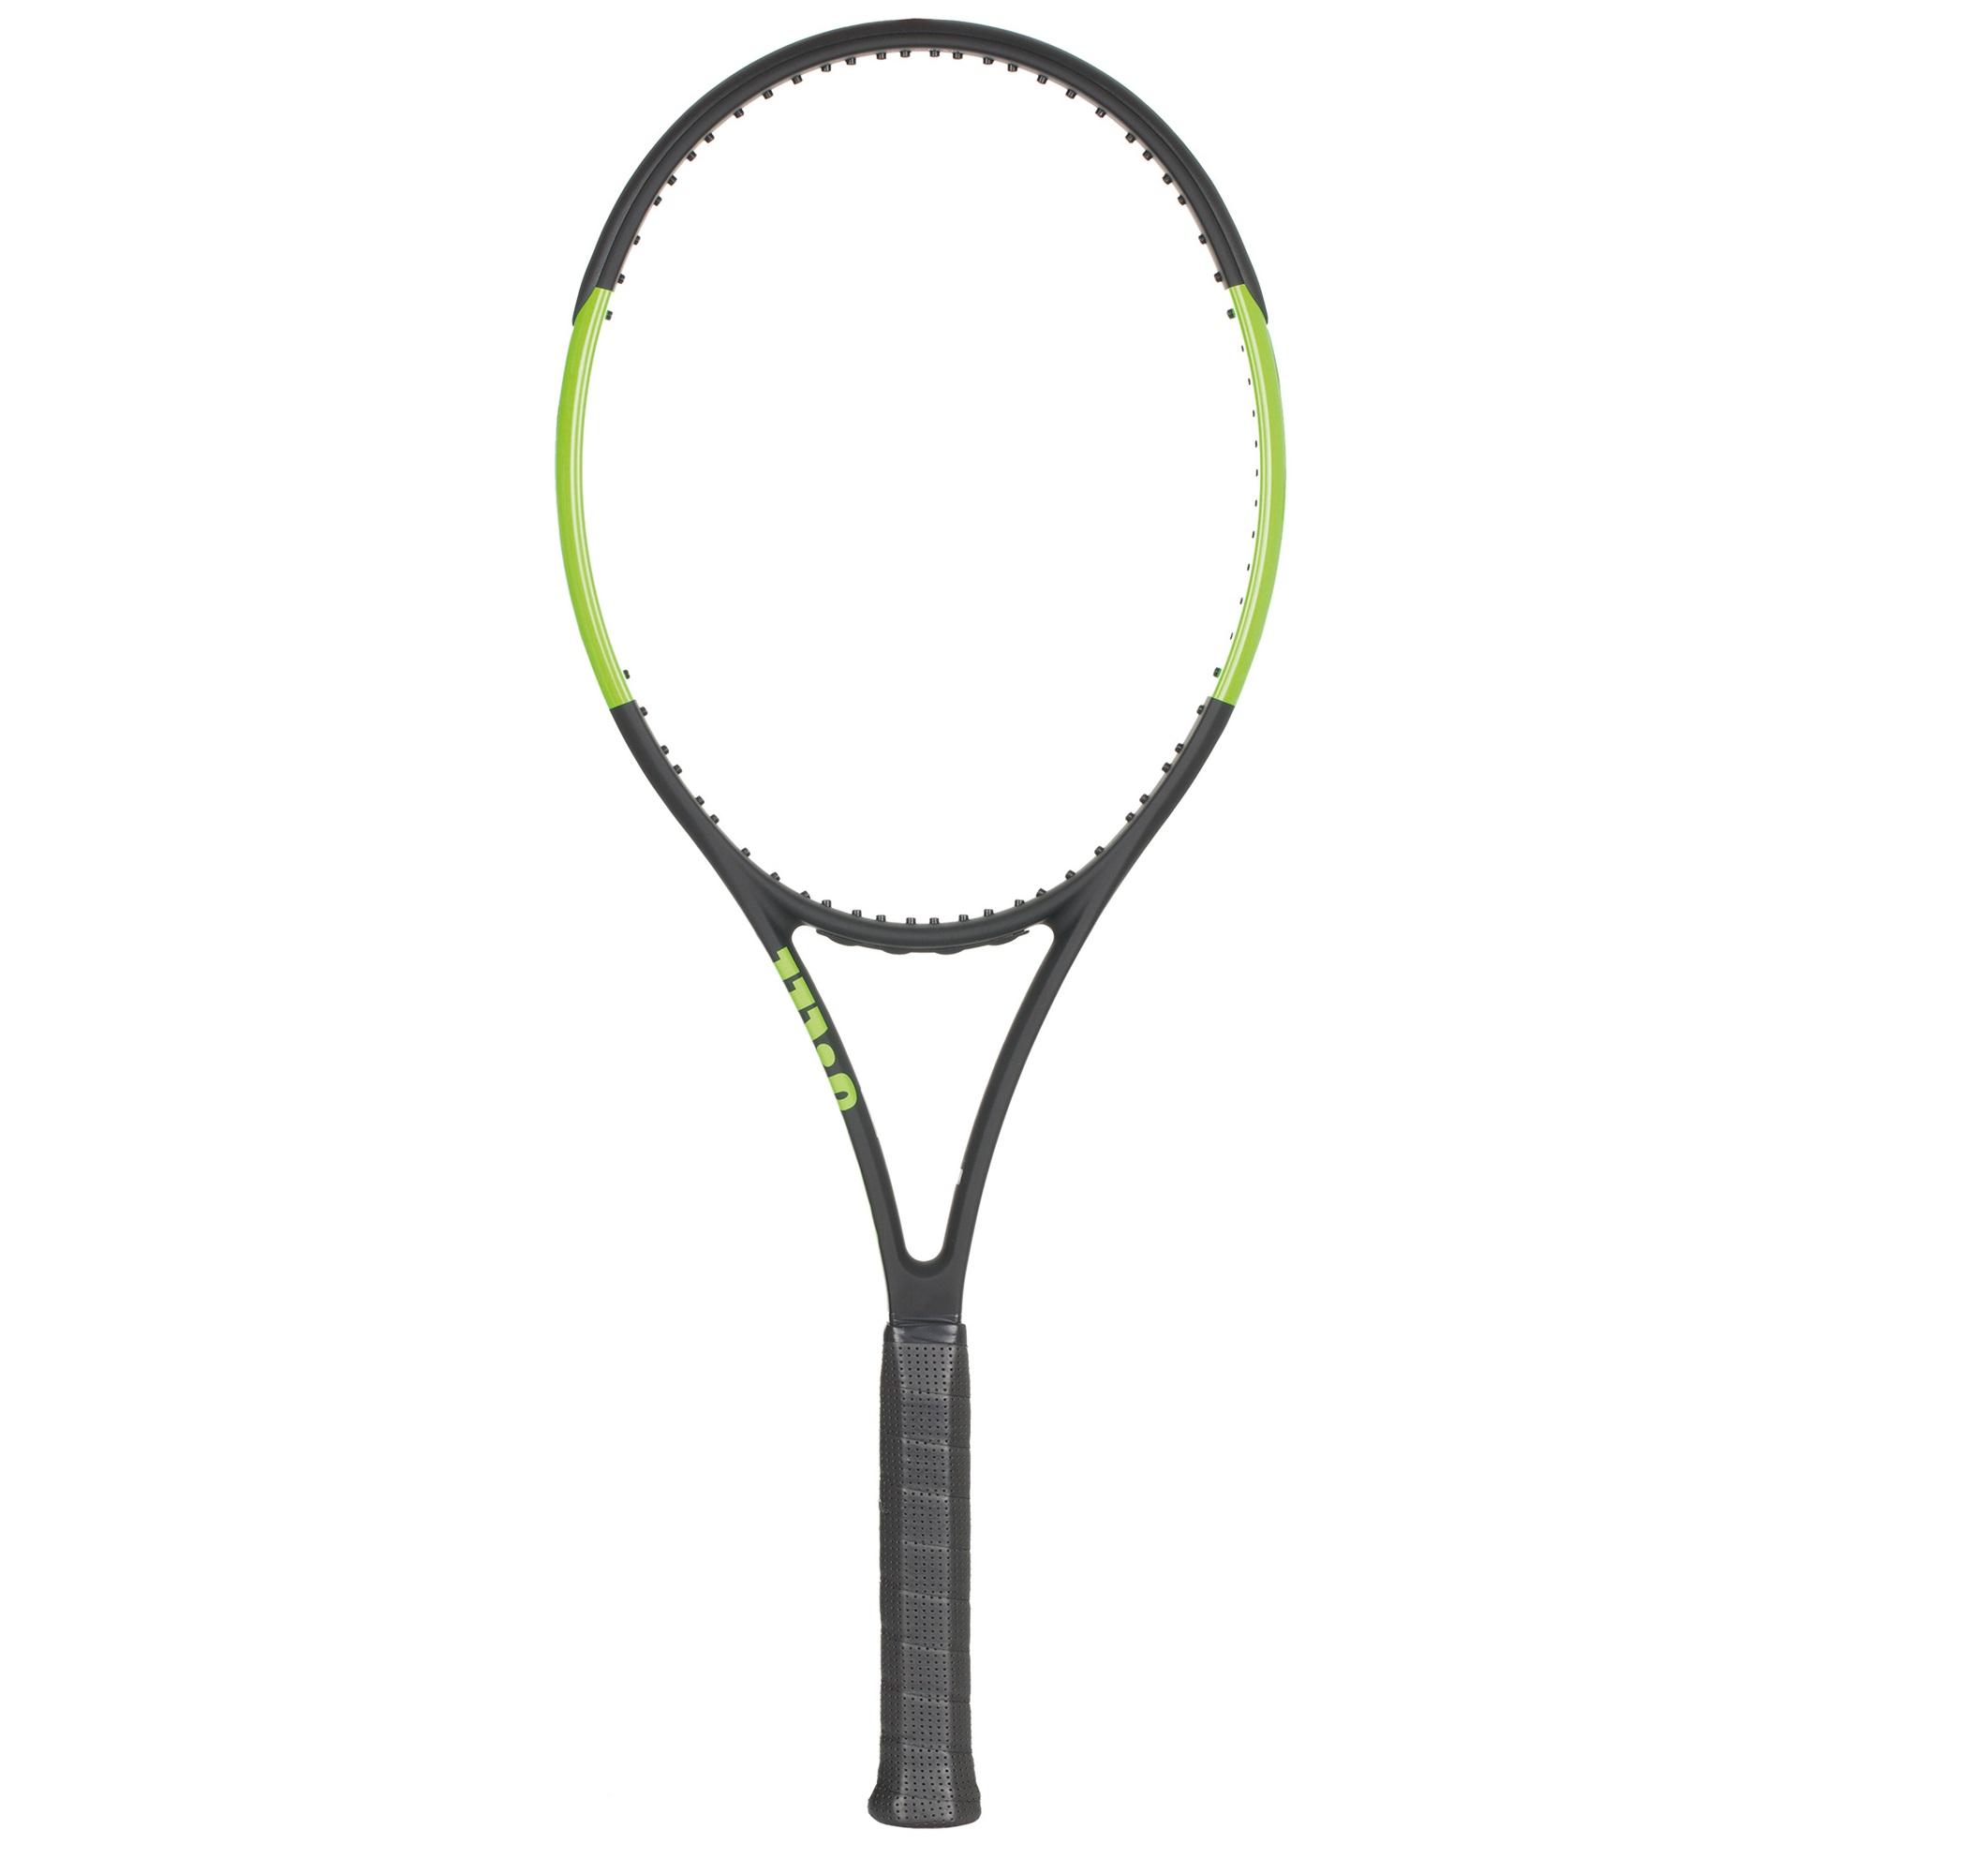 Wilson Ракетка для большого тенниса Wilson Blade 104, размер 4 wilson набор мячей для большого тенниса wilson us open x3 размер без размера